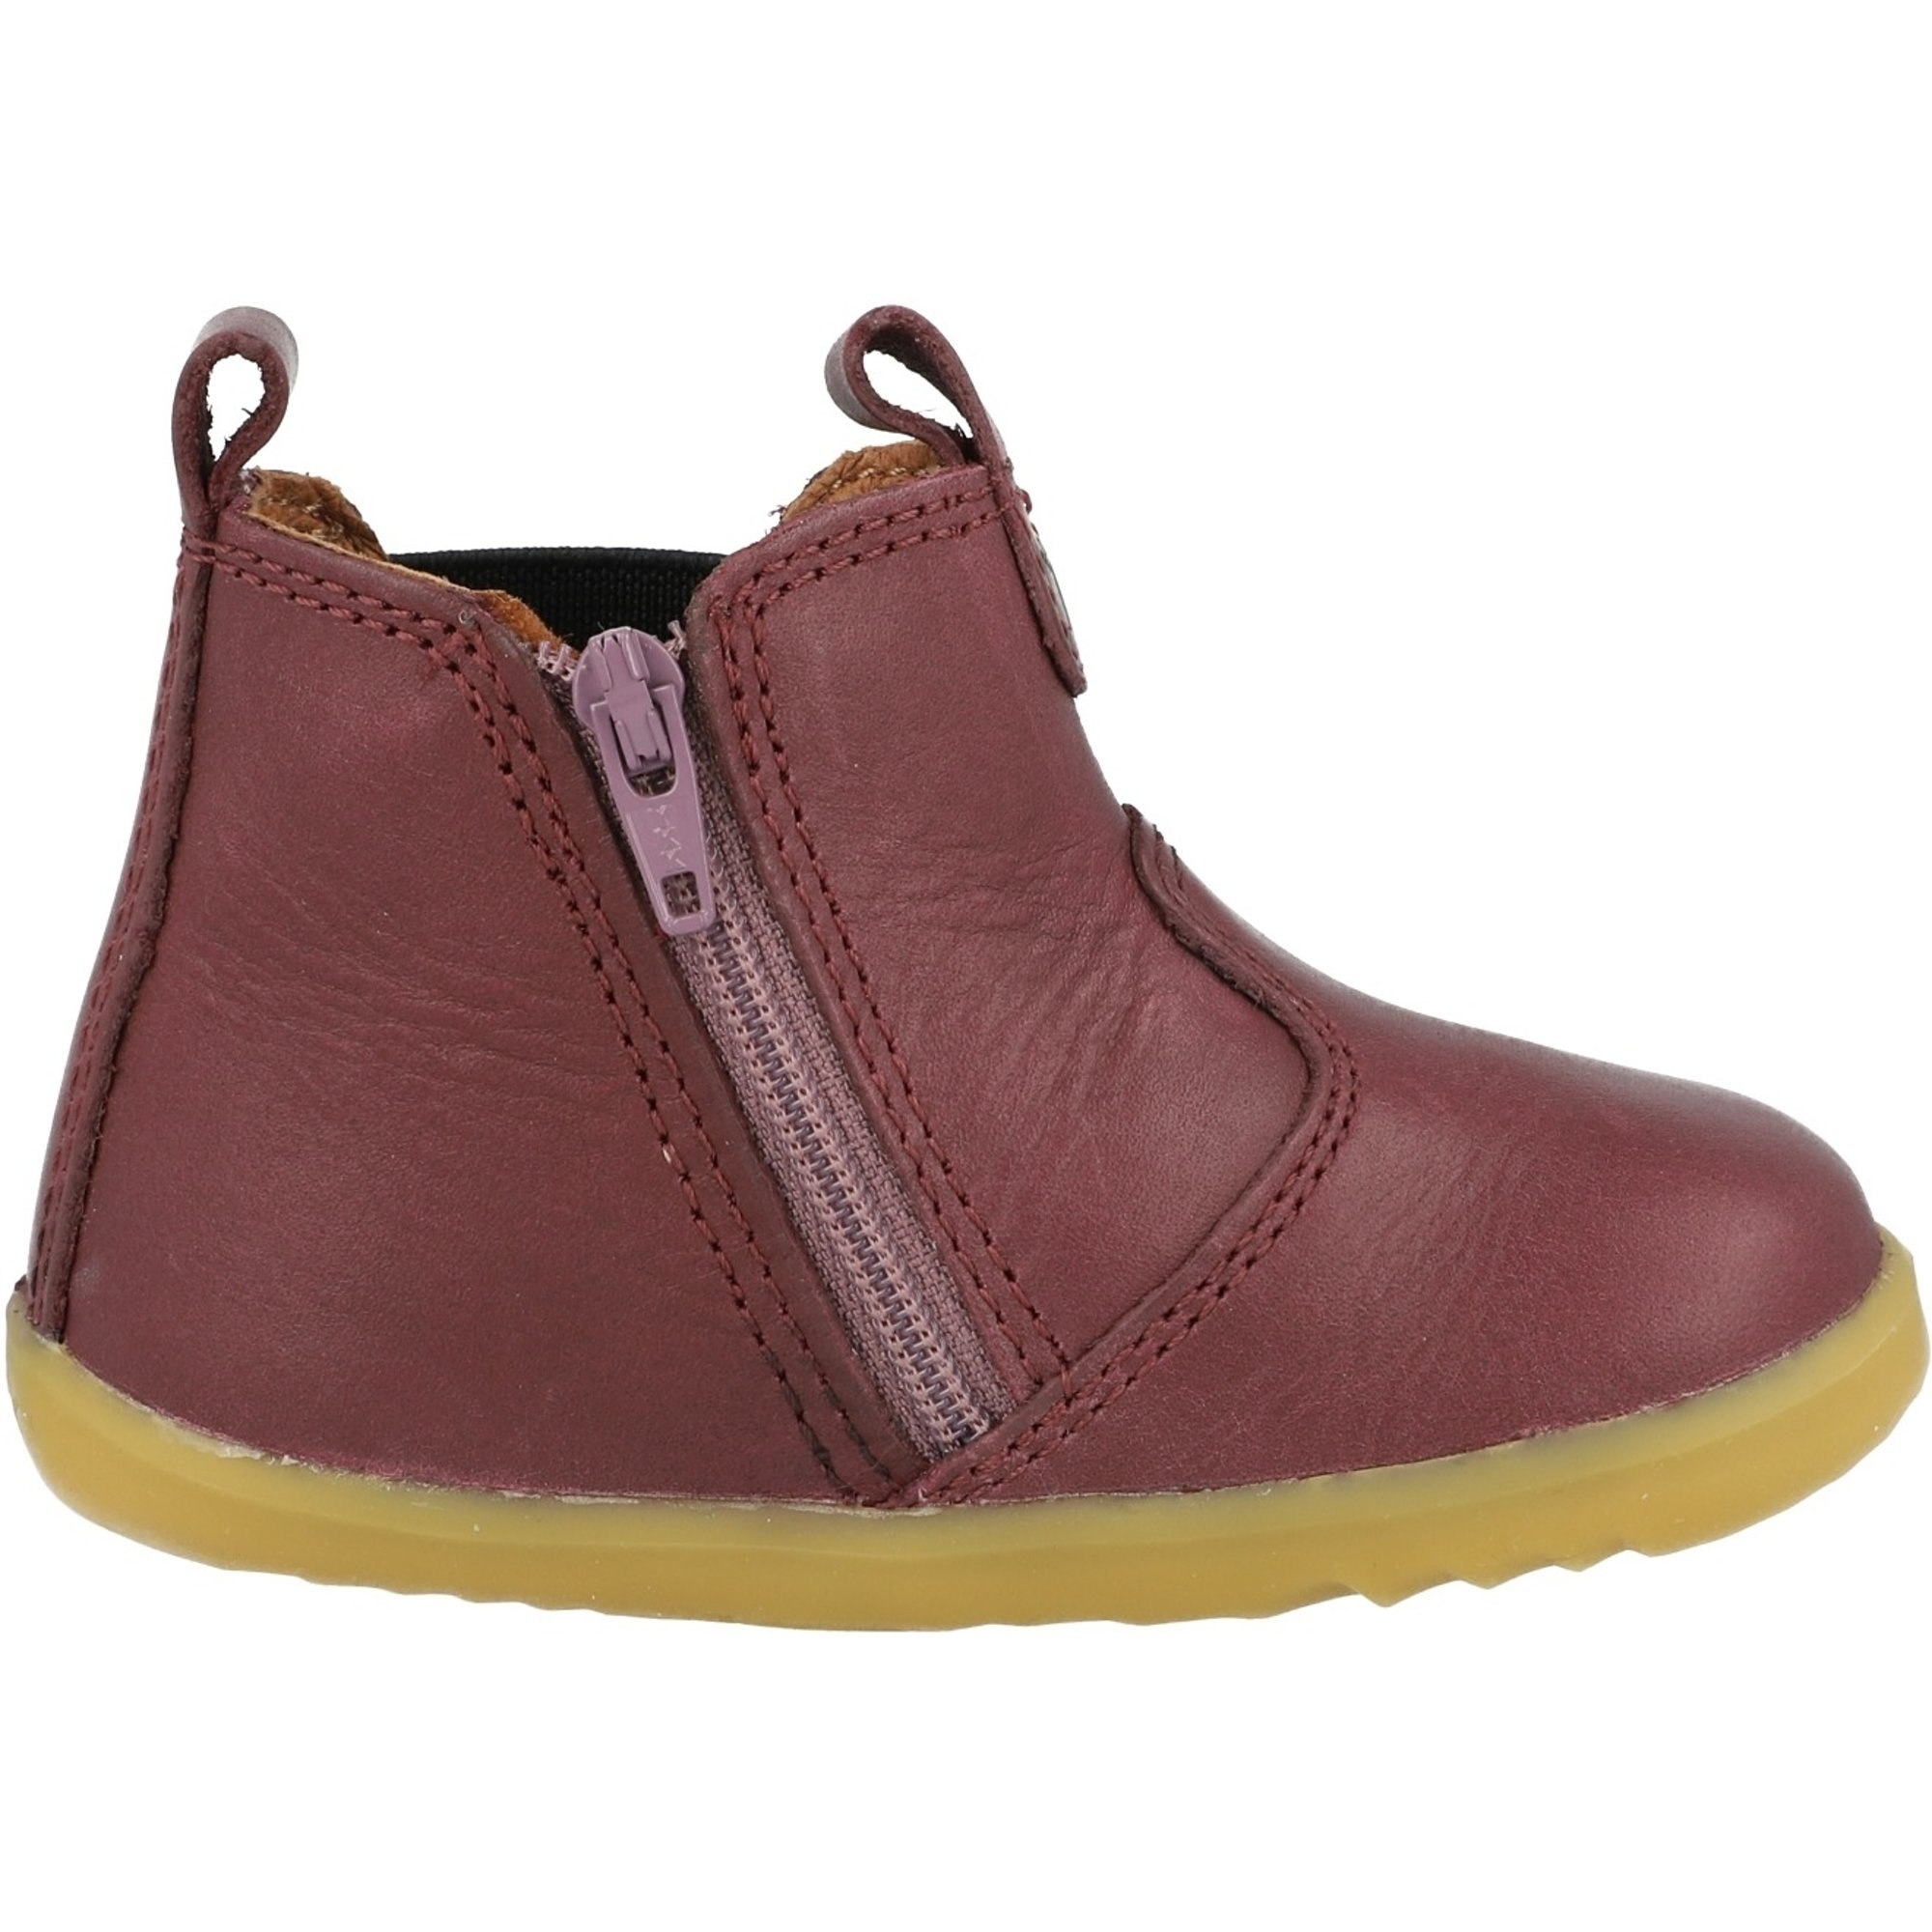 Bobux Step Up Jodhpur Plum Leather